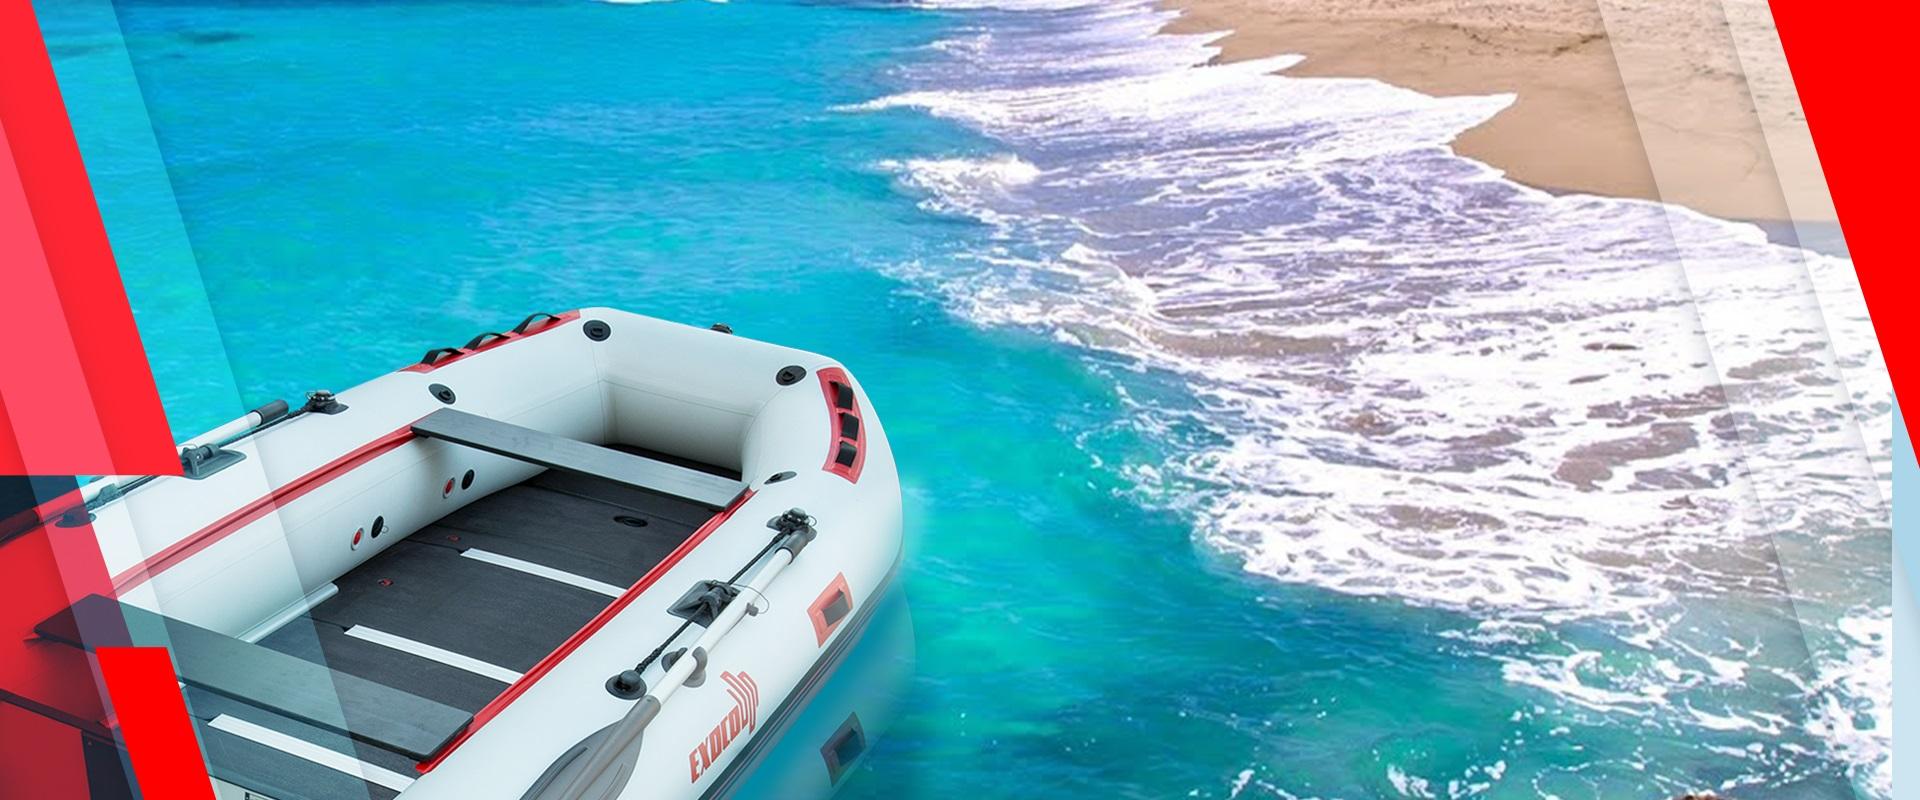 Exoco bateau pneumatique